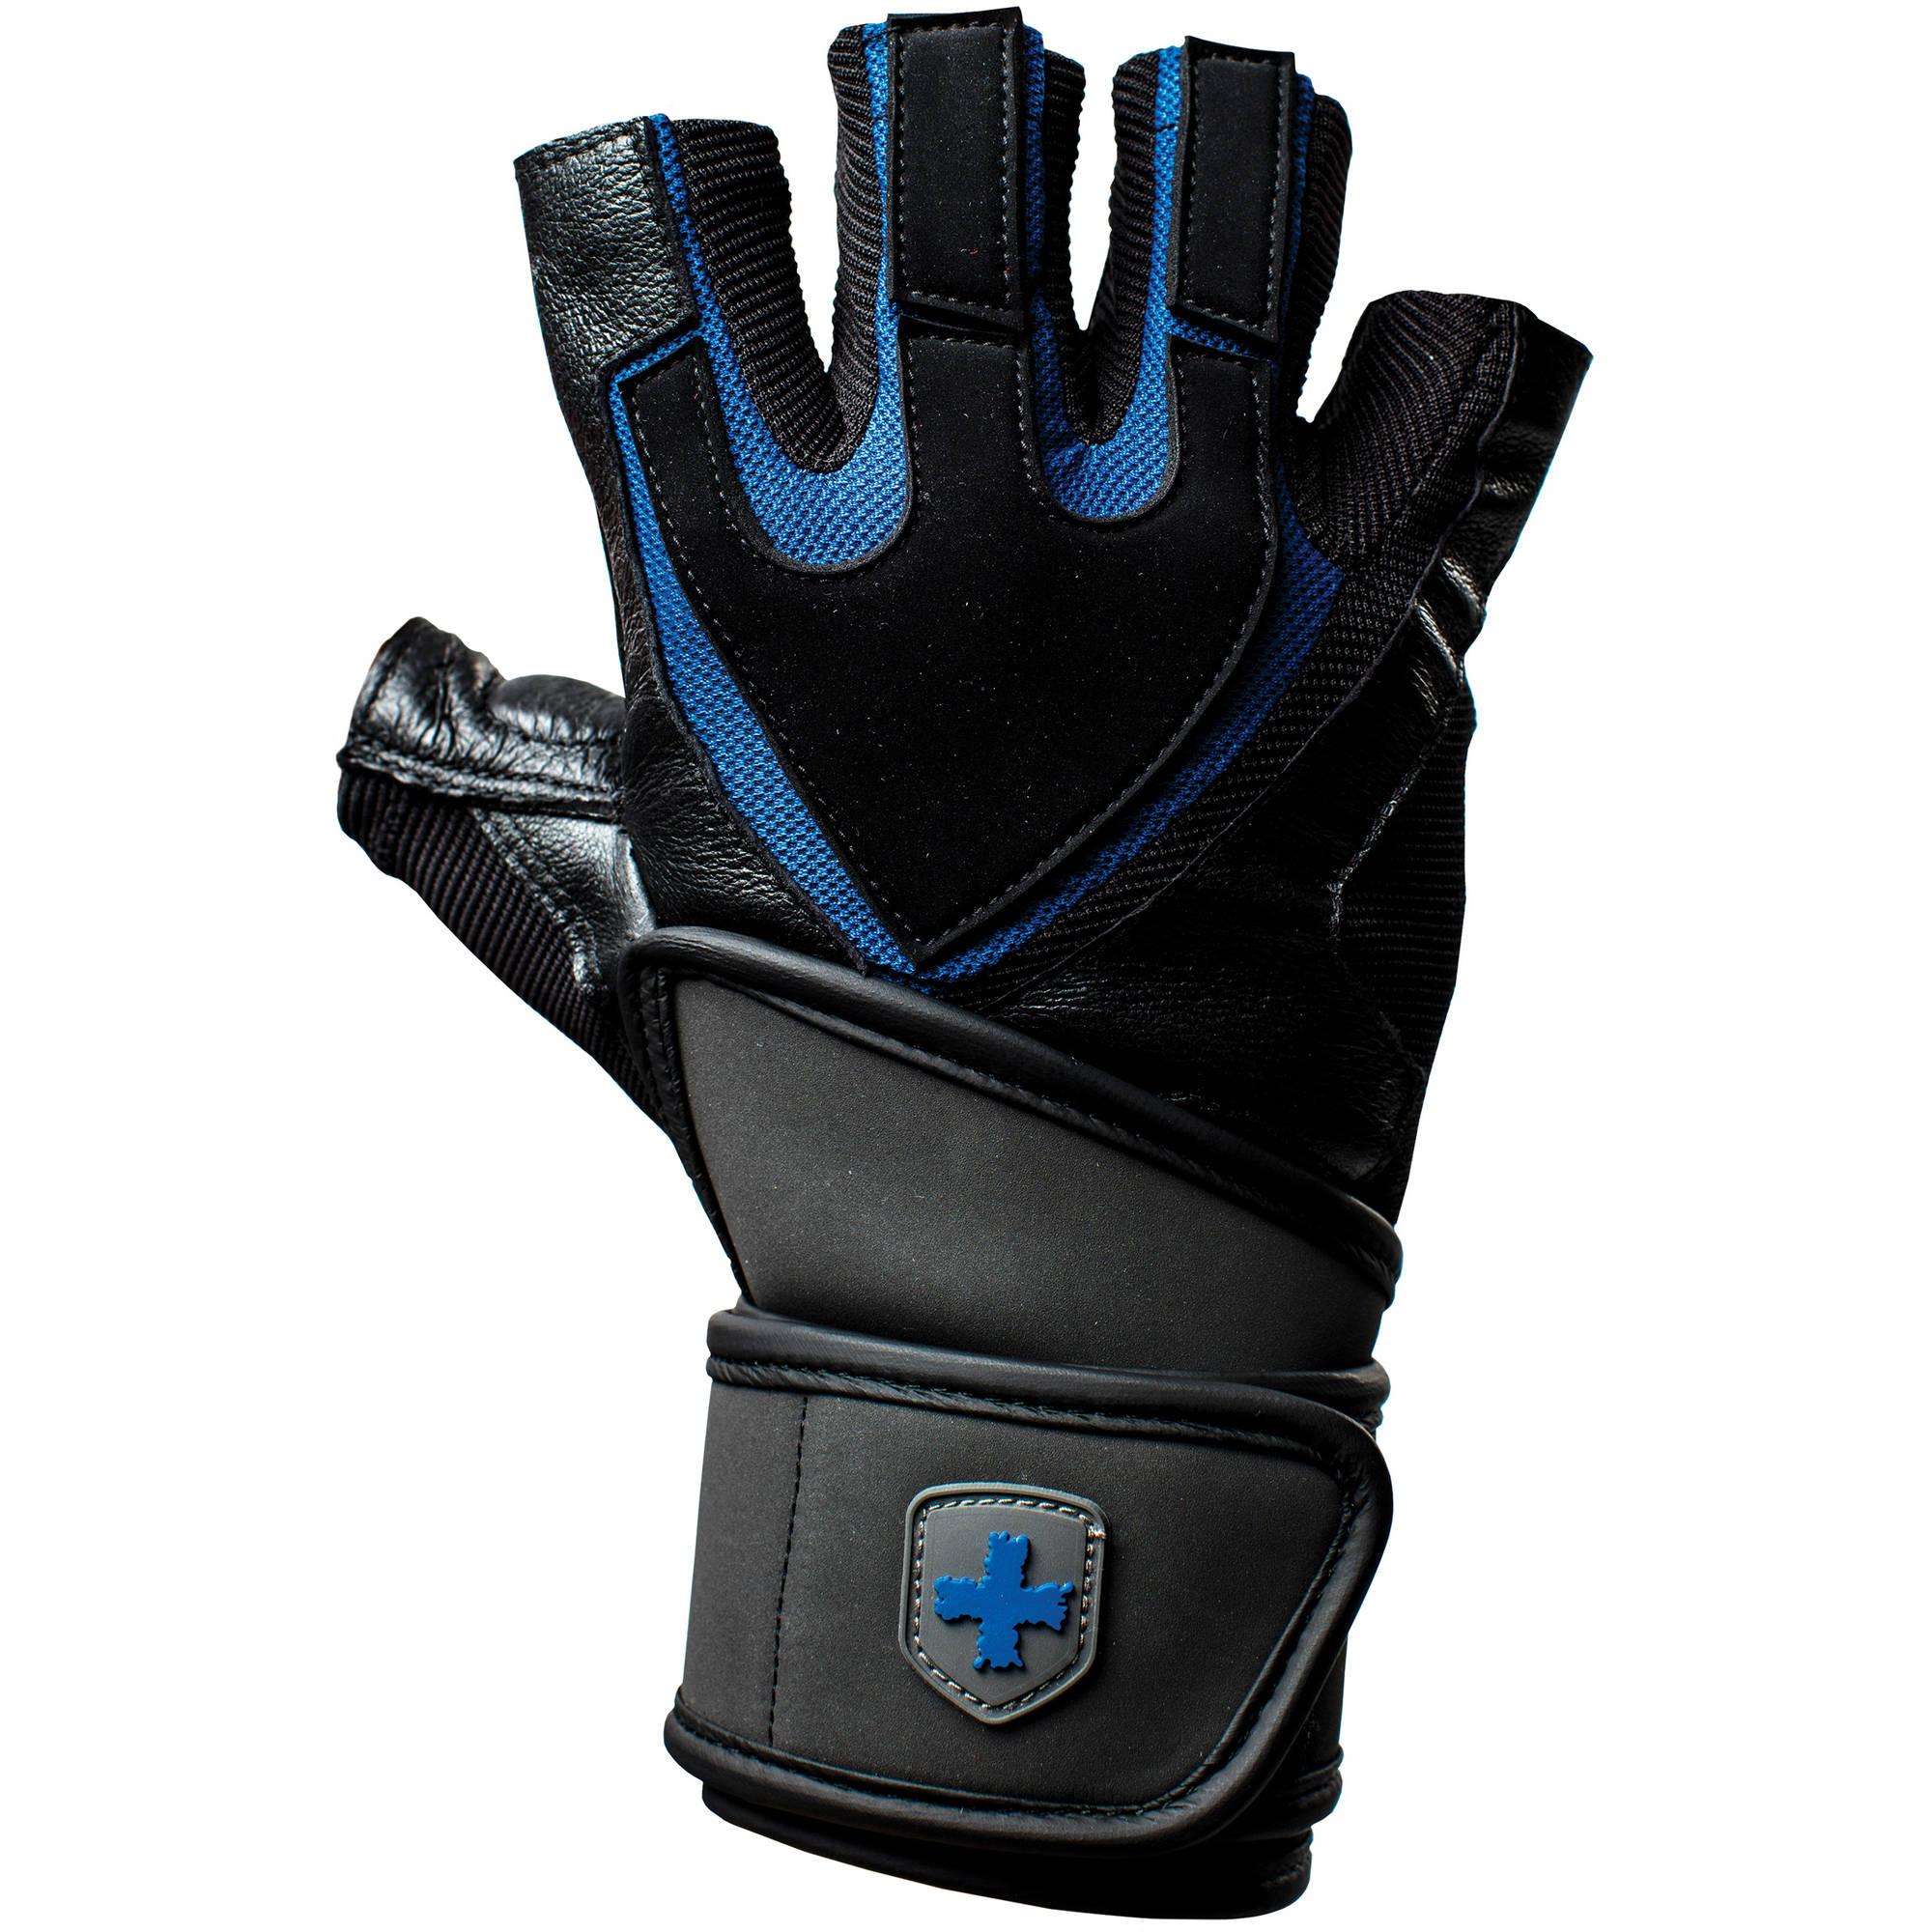 Harbinger Training Grip WristWrap Glove by Harbinger